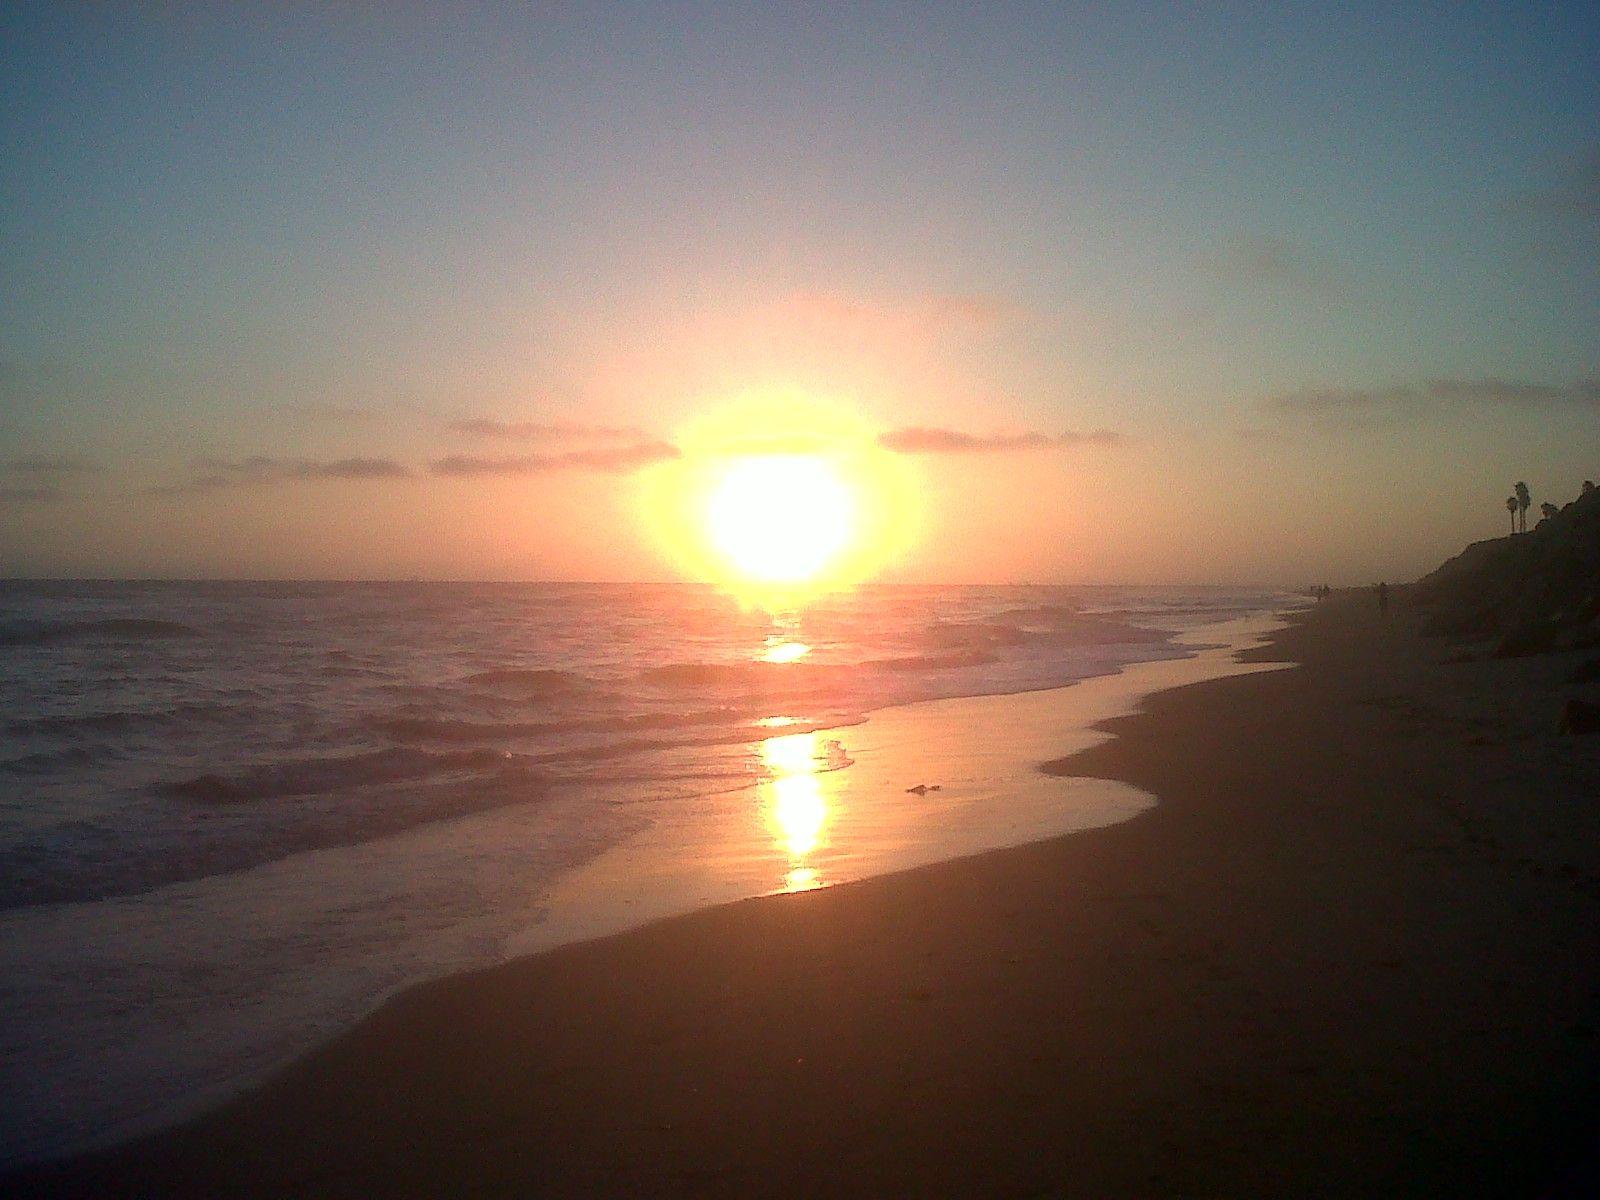 Sunsets...magic